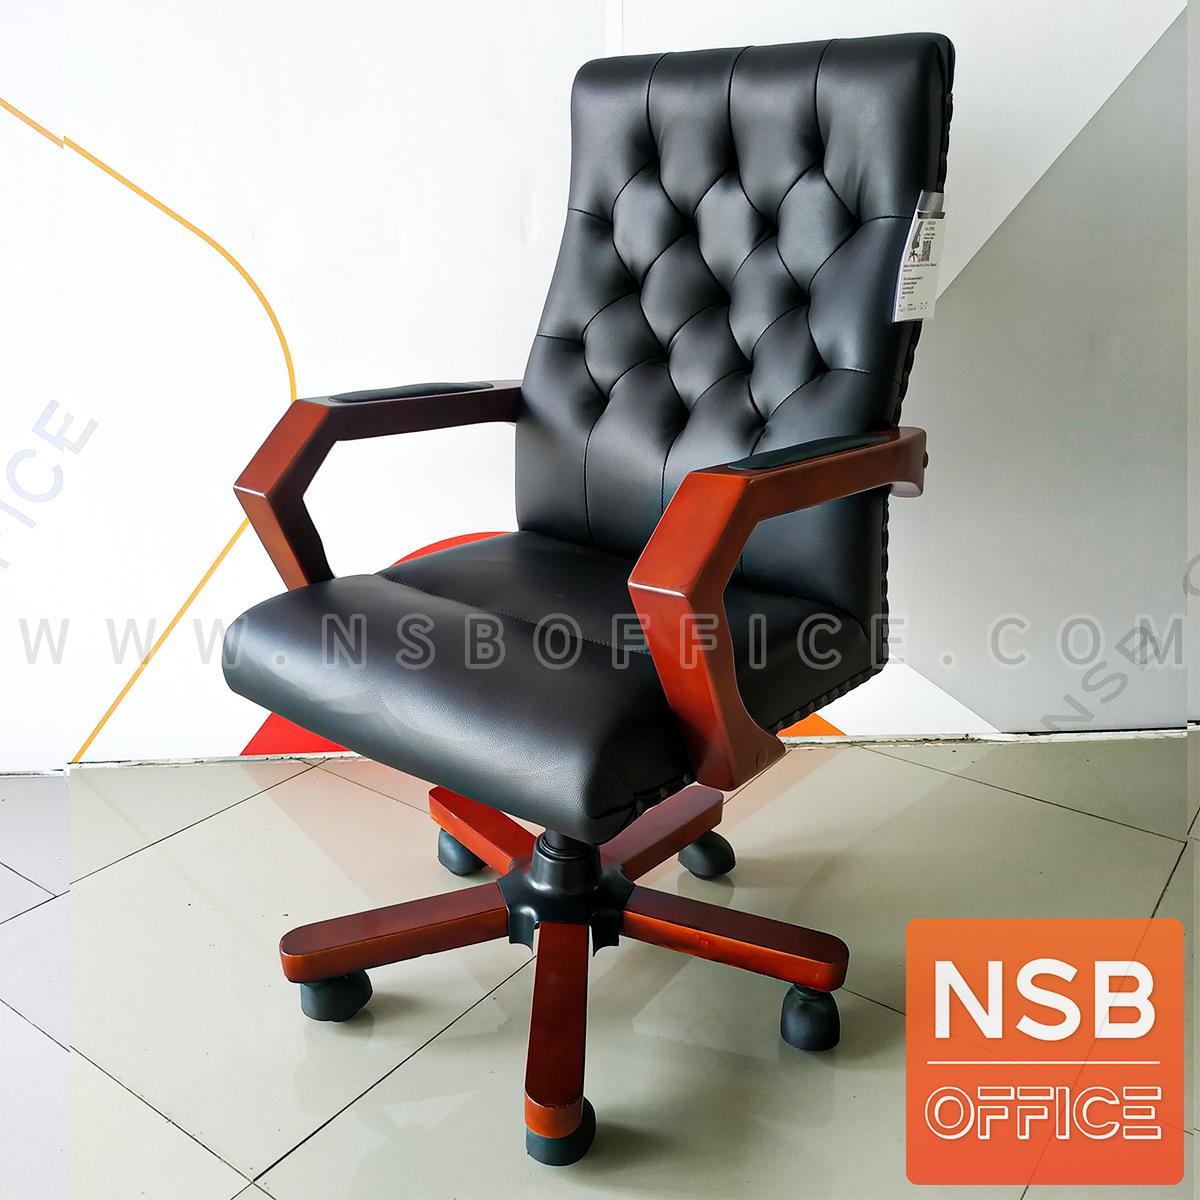 B25A118:เก้าอี้ผู้บริหารหนัง PU รุ่น Goldstein (โกลสไตล์)  โช๊คแก๊ส มีก้อนโยก ขาไม้